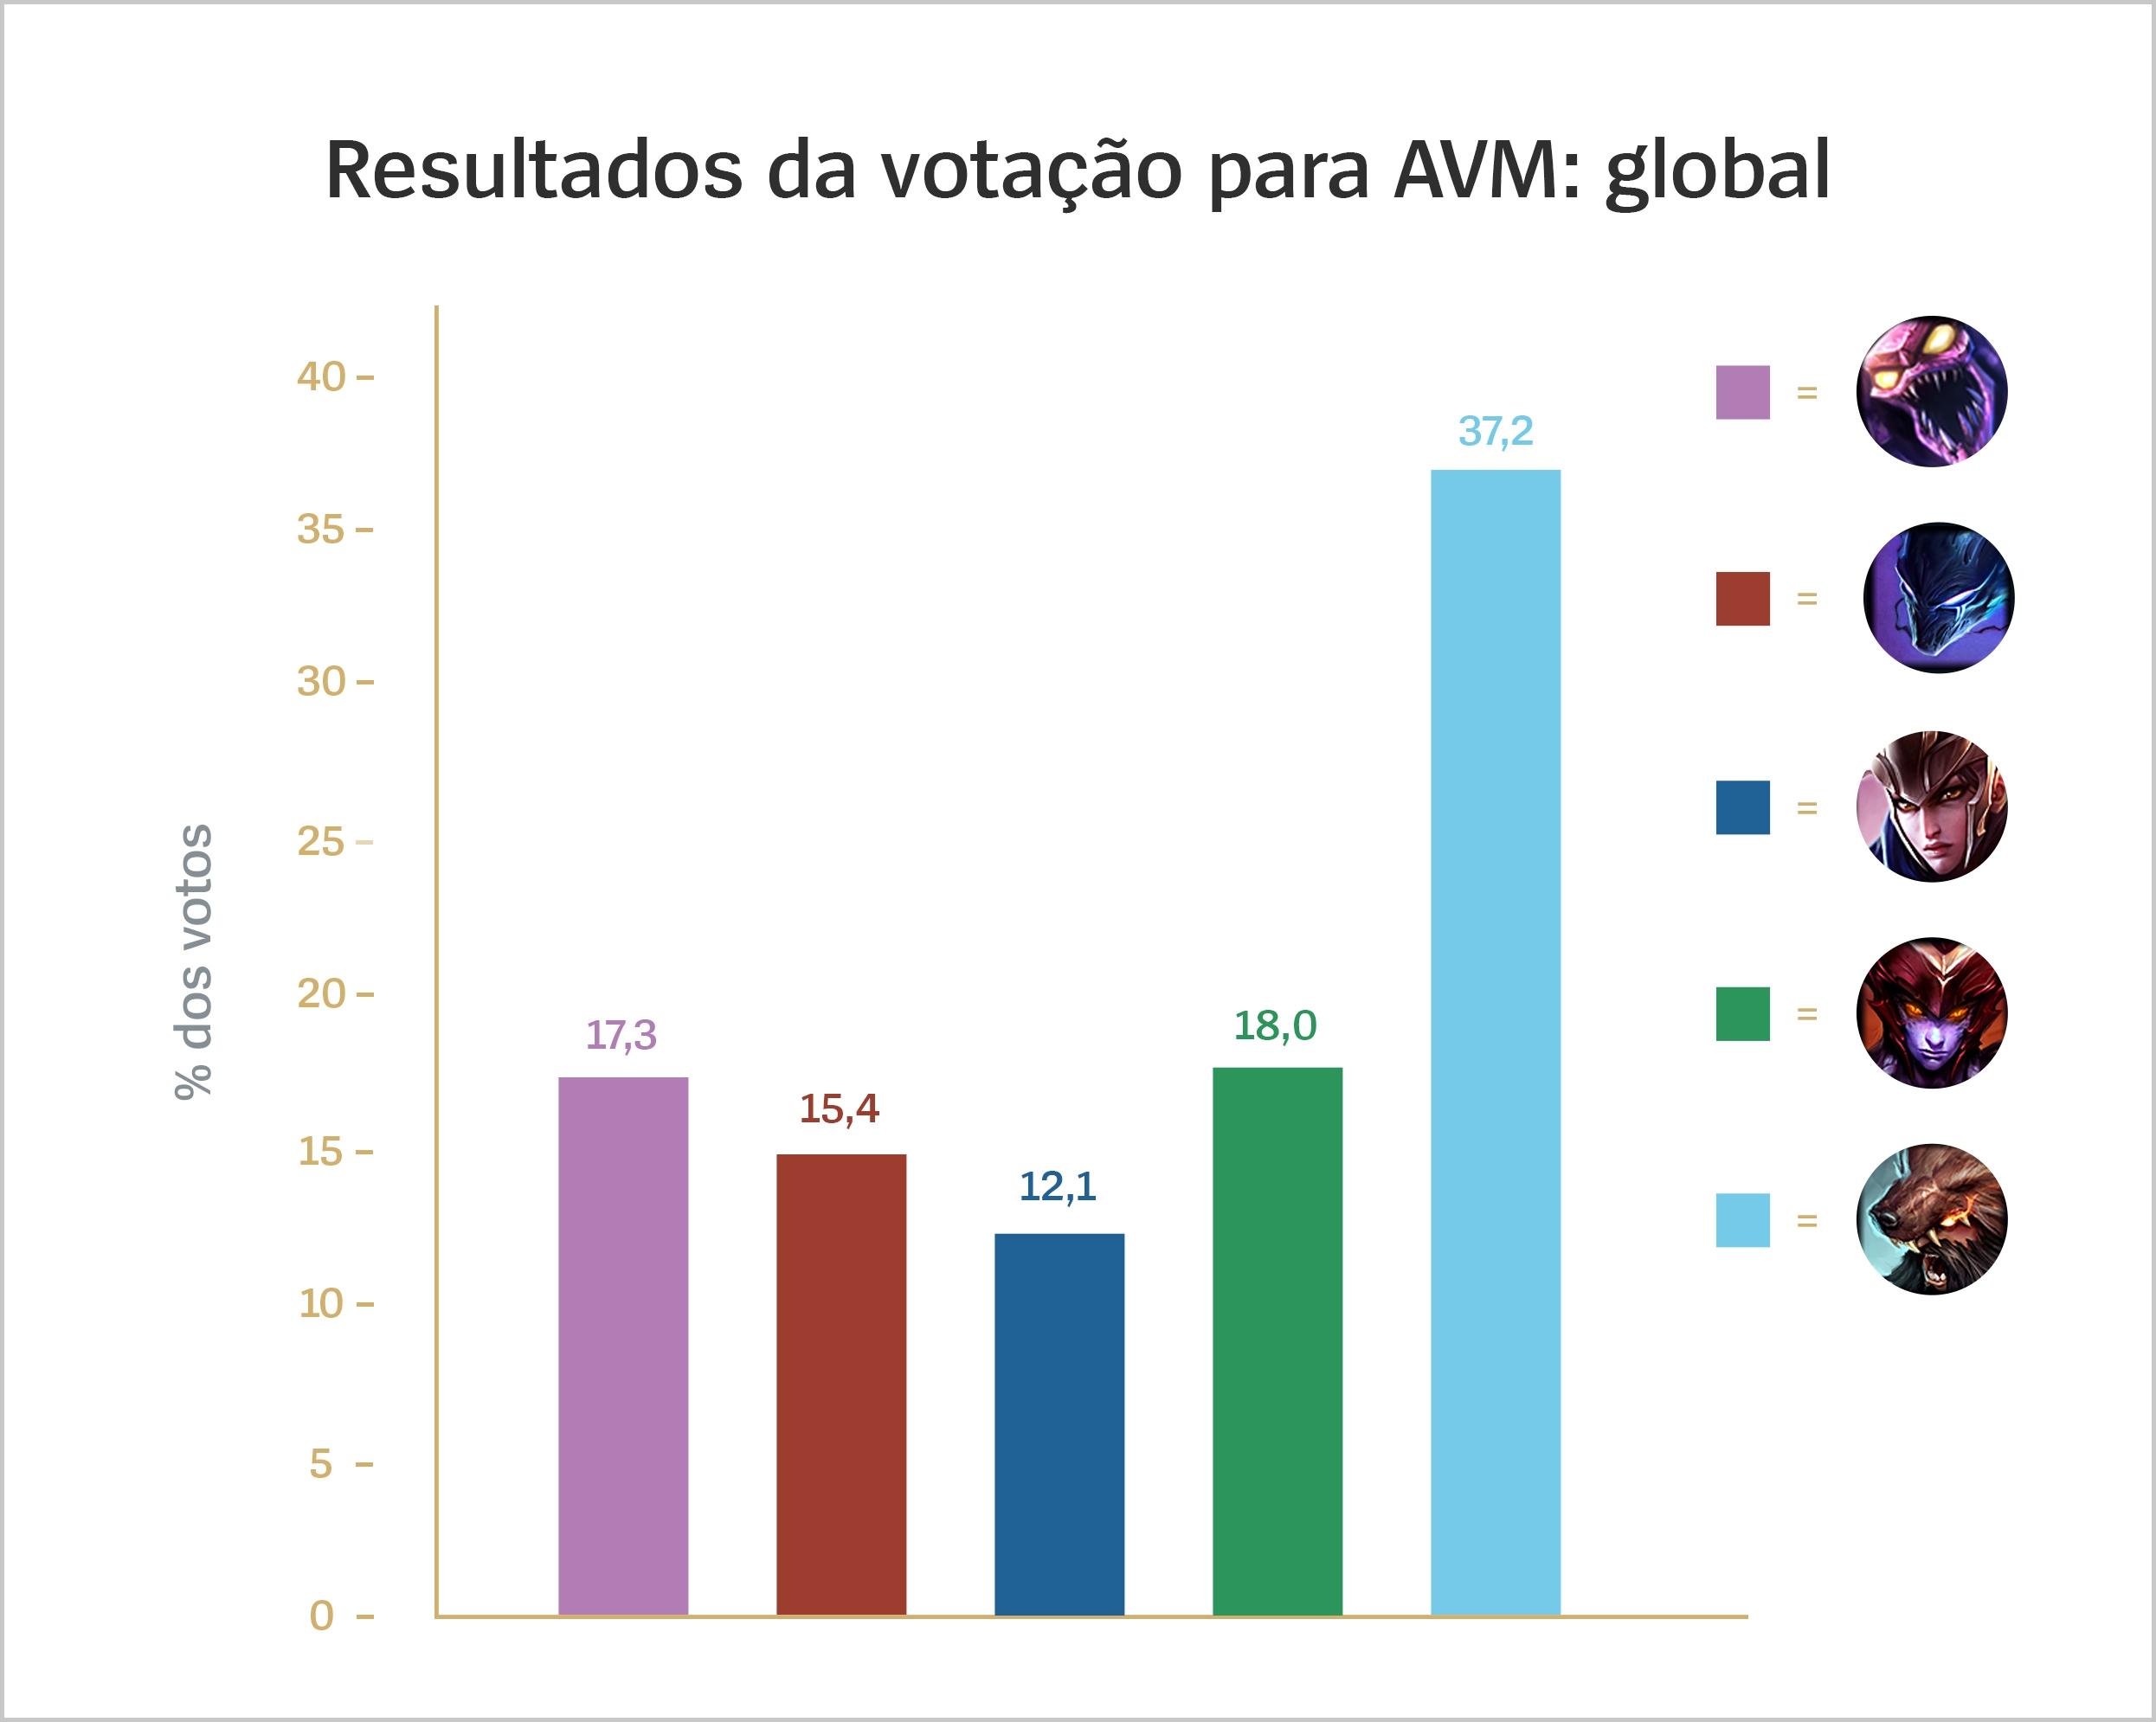 VGU_Voting_Results_For_Loc_por-BR.jpg